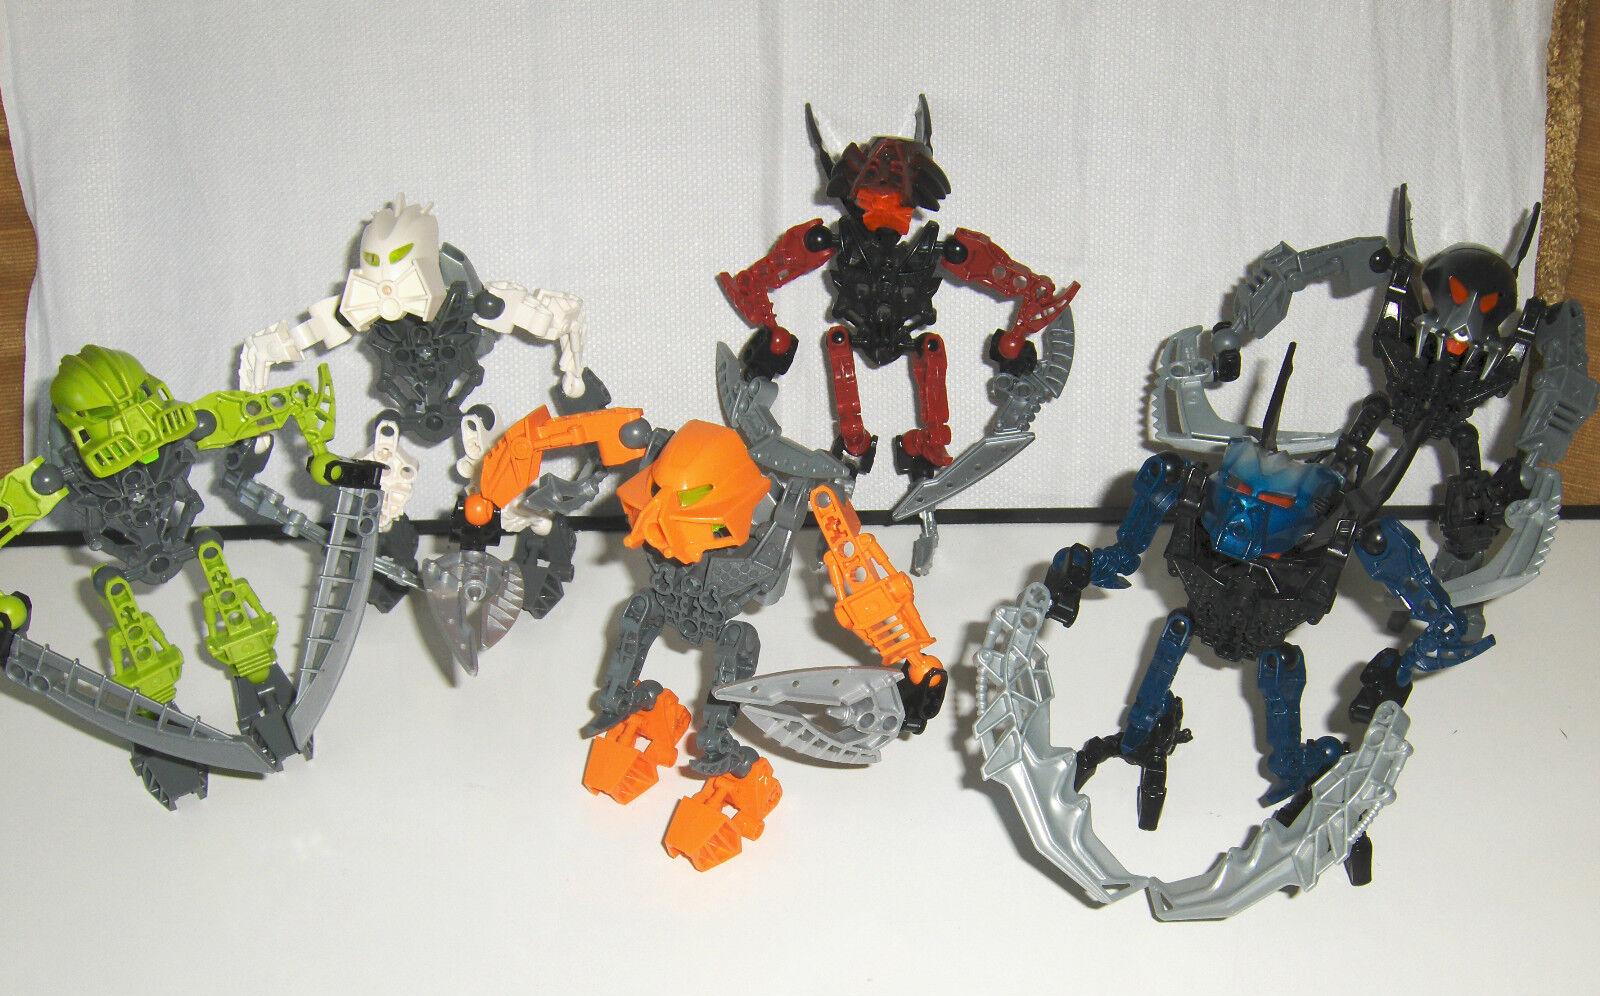 LEGO K8944 MATORAN OF LIGHT COLLECTION, COMPLETE, 8944 8945 8946 8947 8948 8949